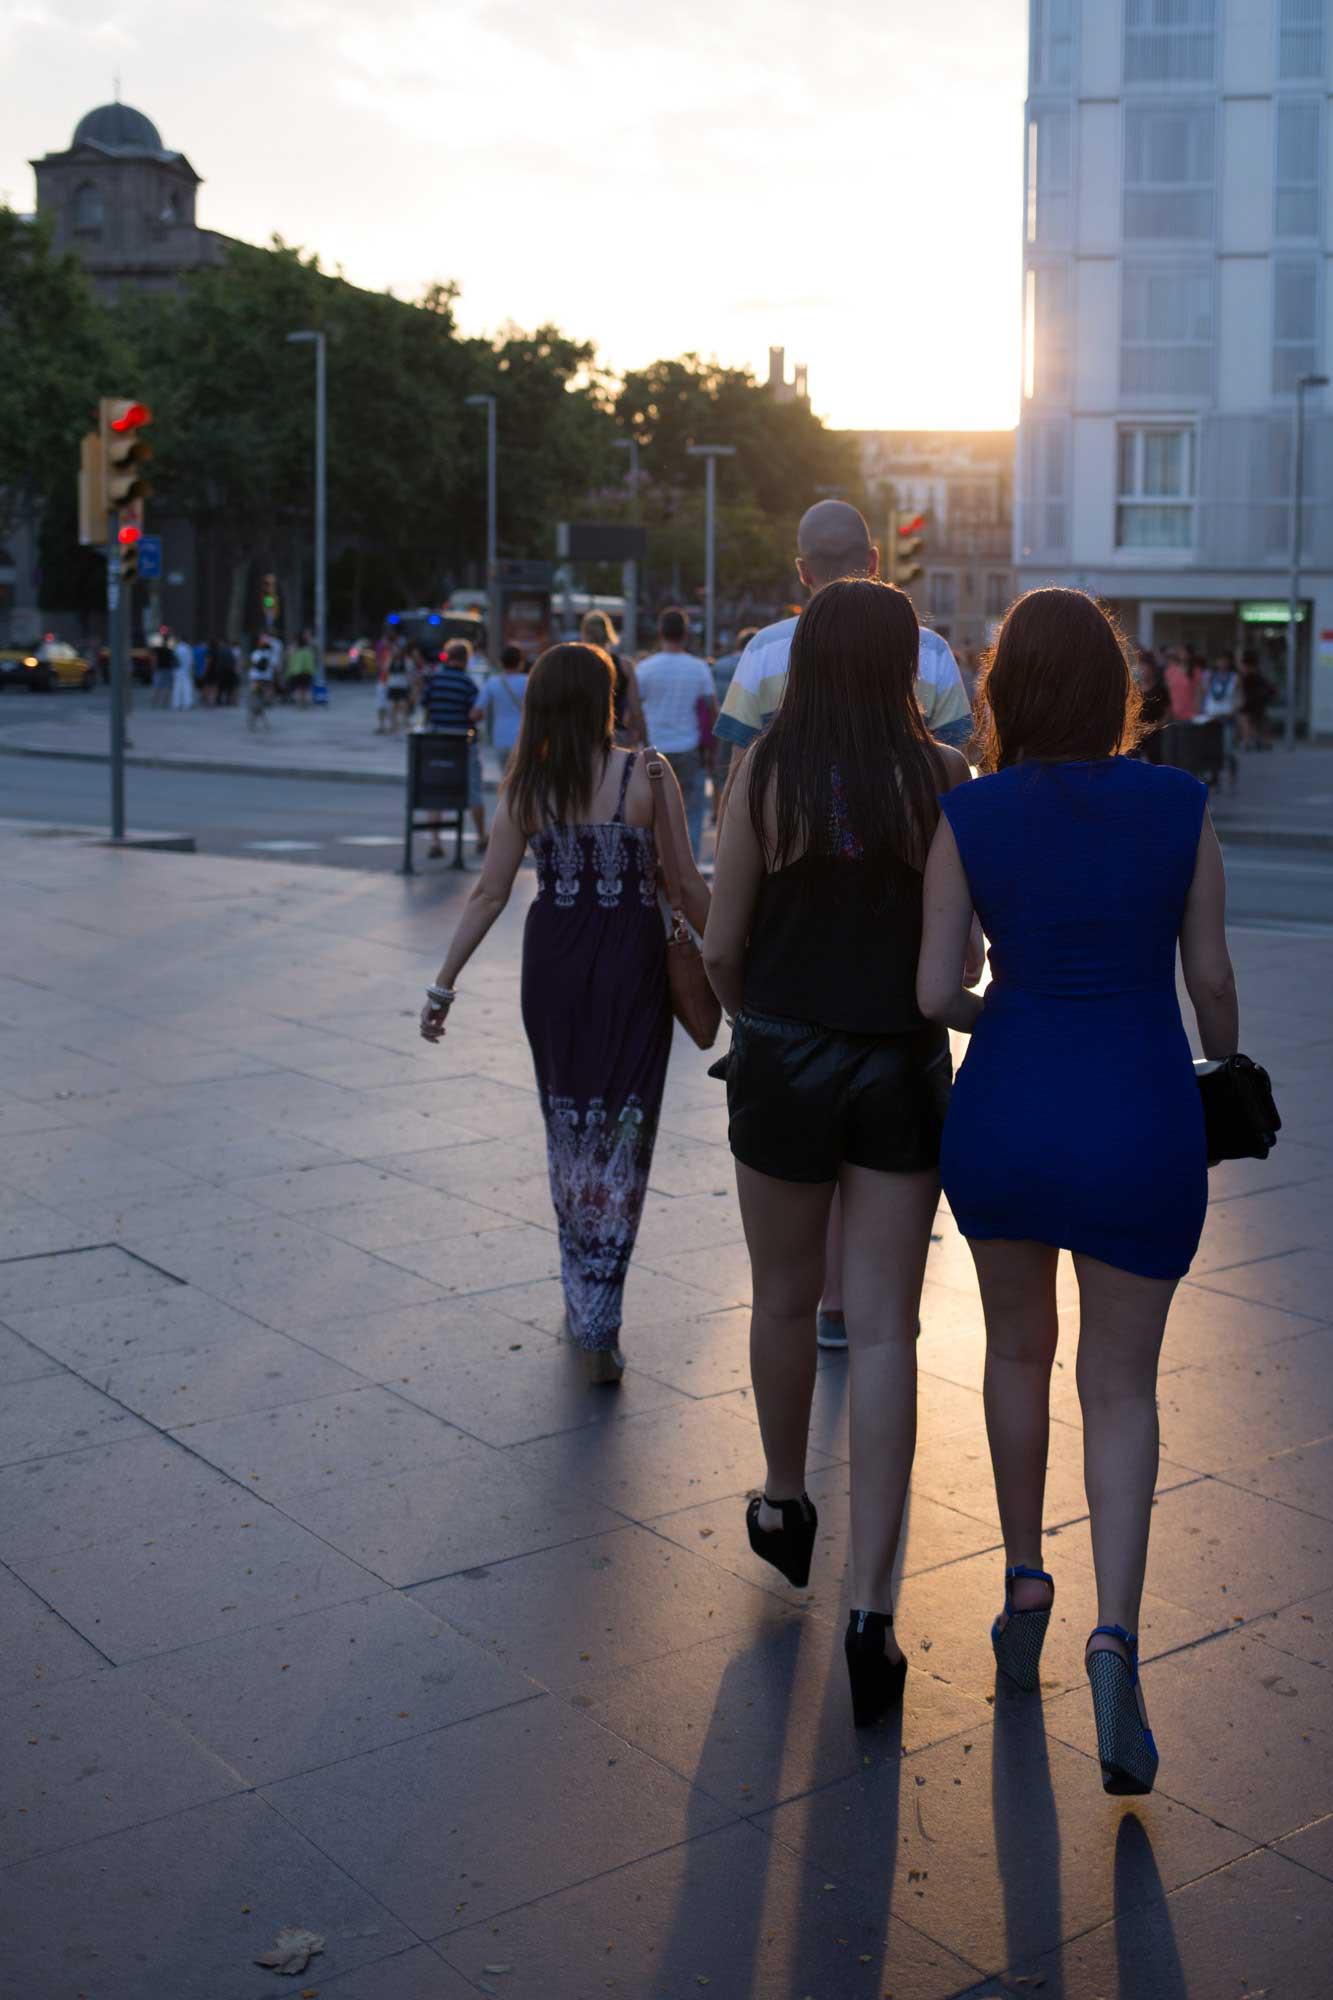 2014 — Fashion and evening light near Barceloneta